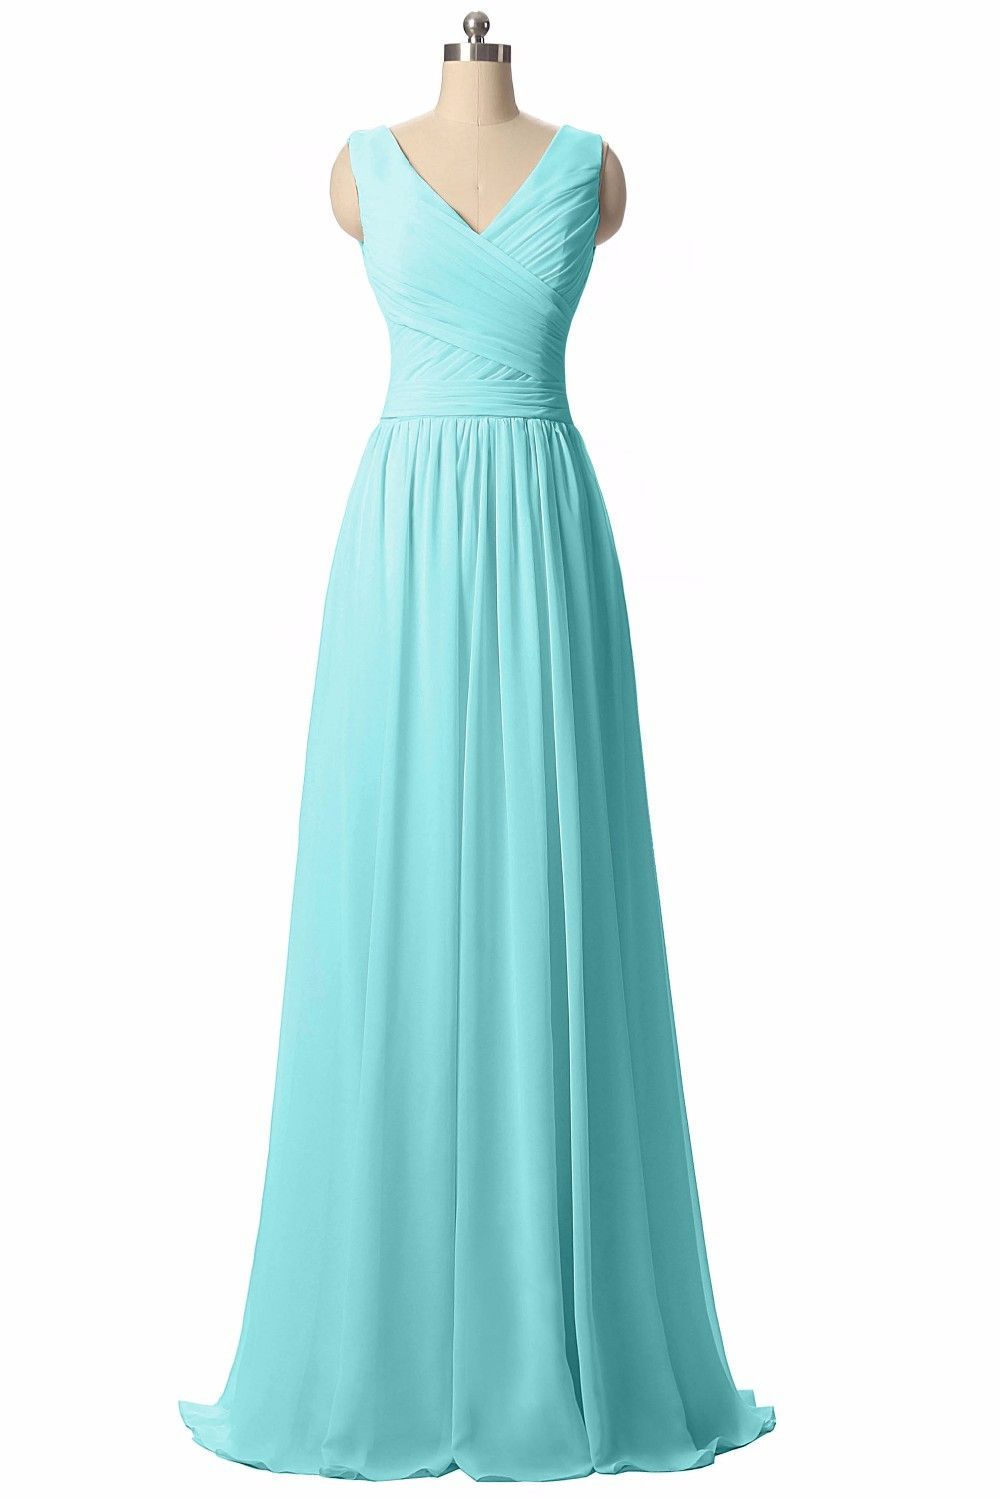 Long Chiffon V Neck Bridesmaid Dress   Bridal stores, Bride bouquets ...